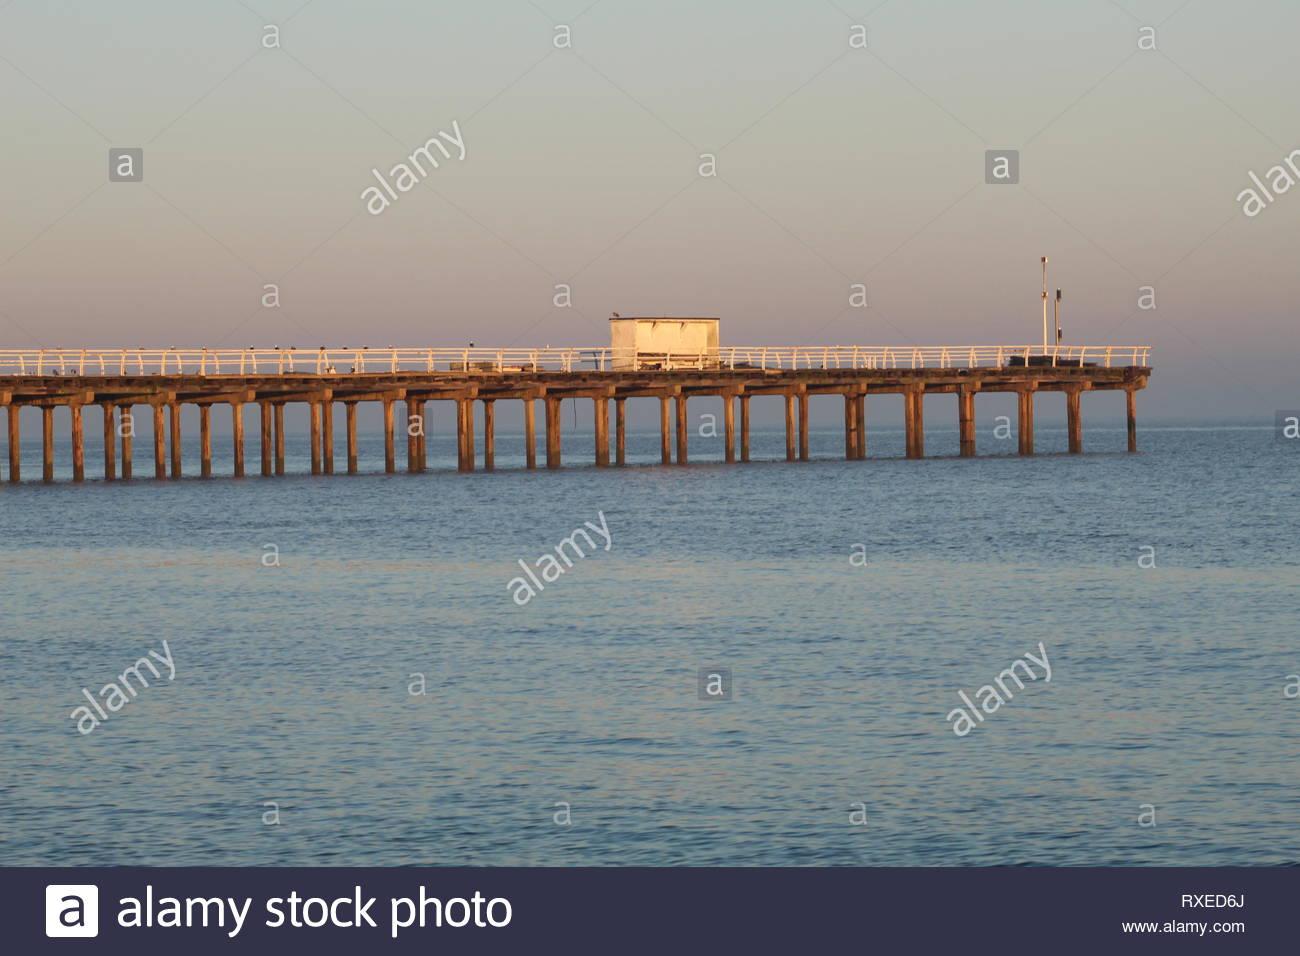 Wood Pier in England at sundown - Stock Image